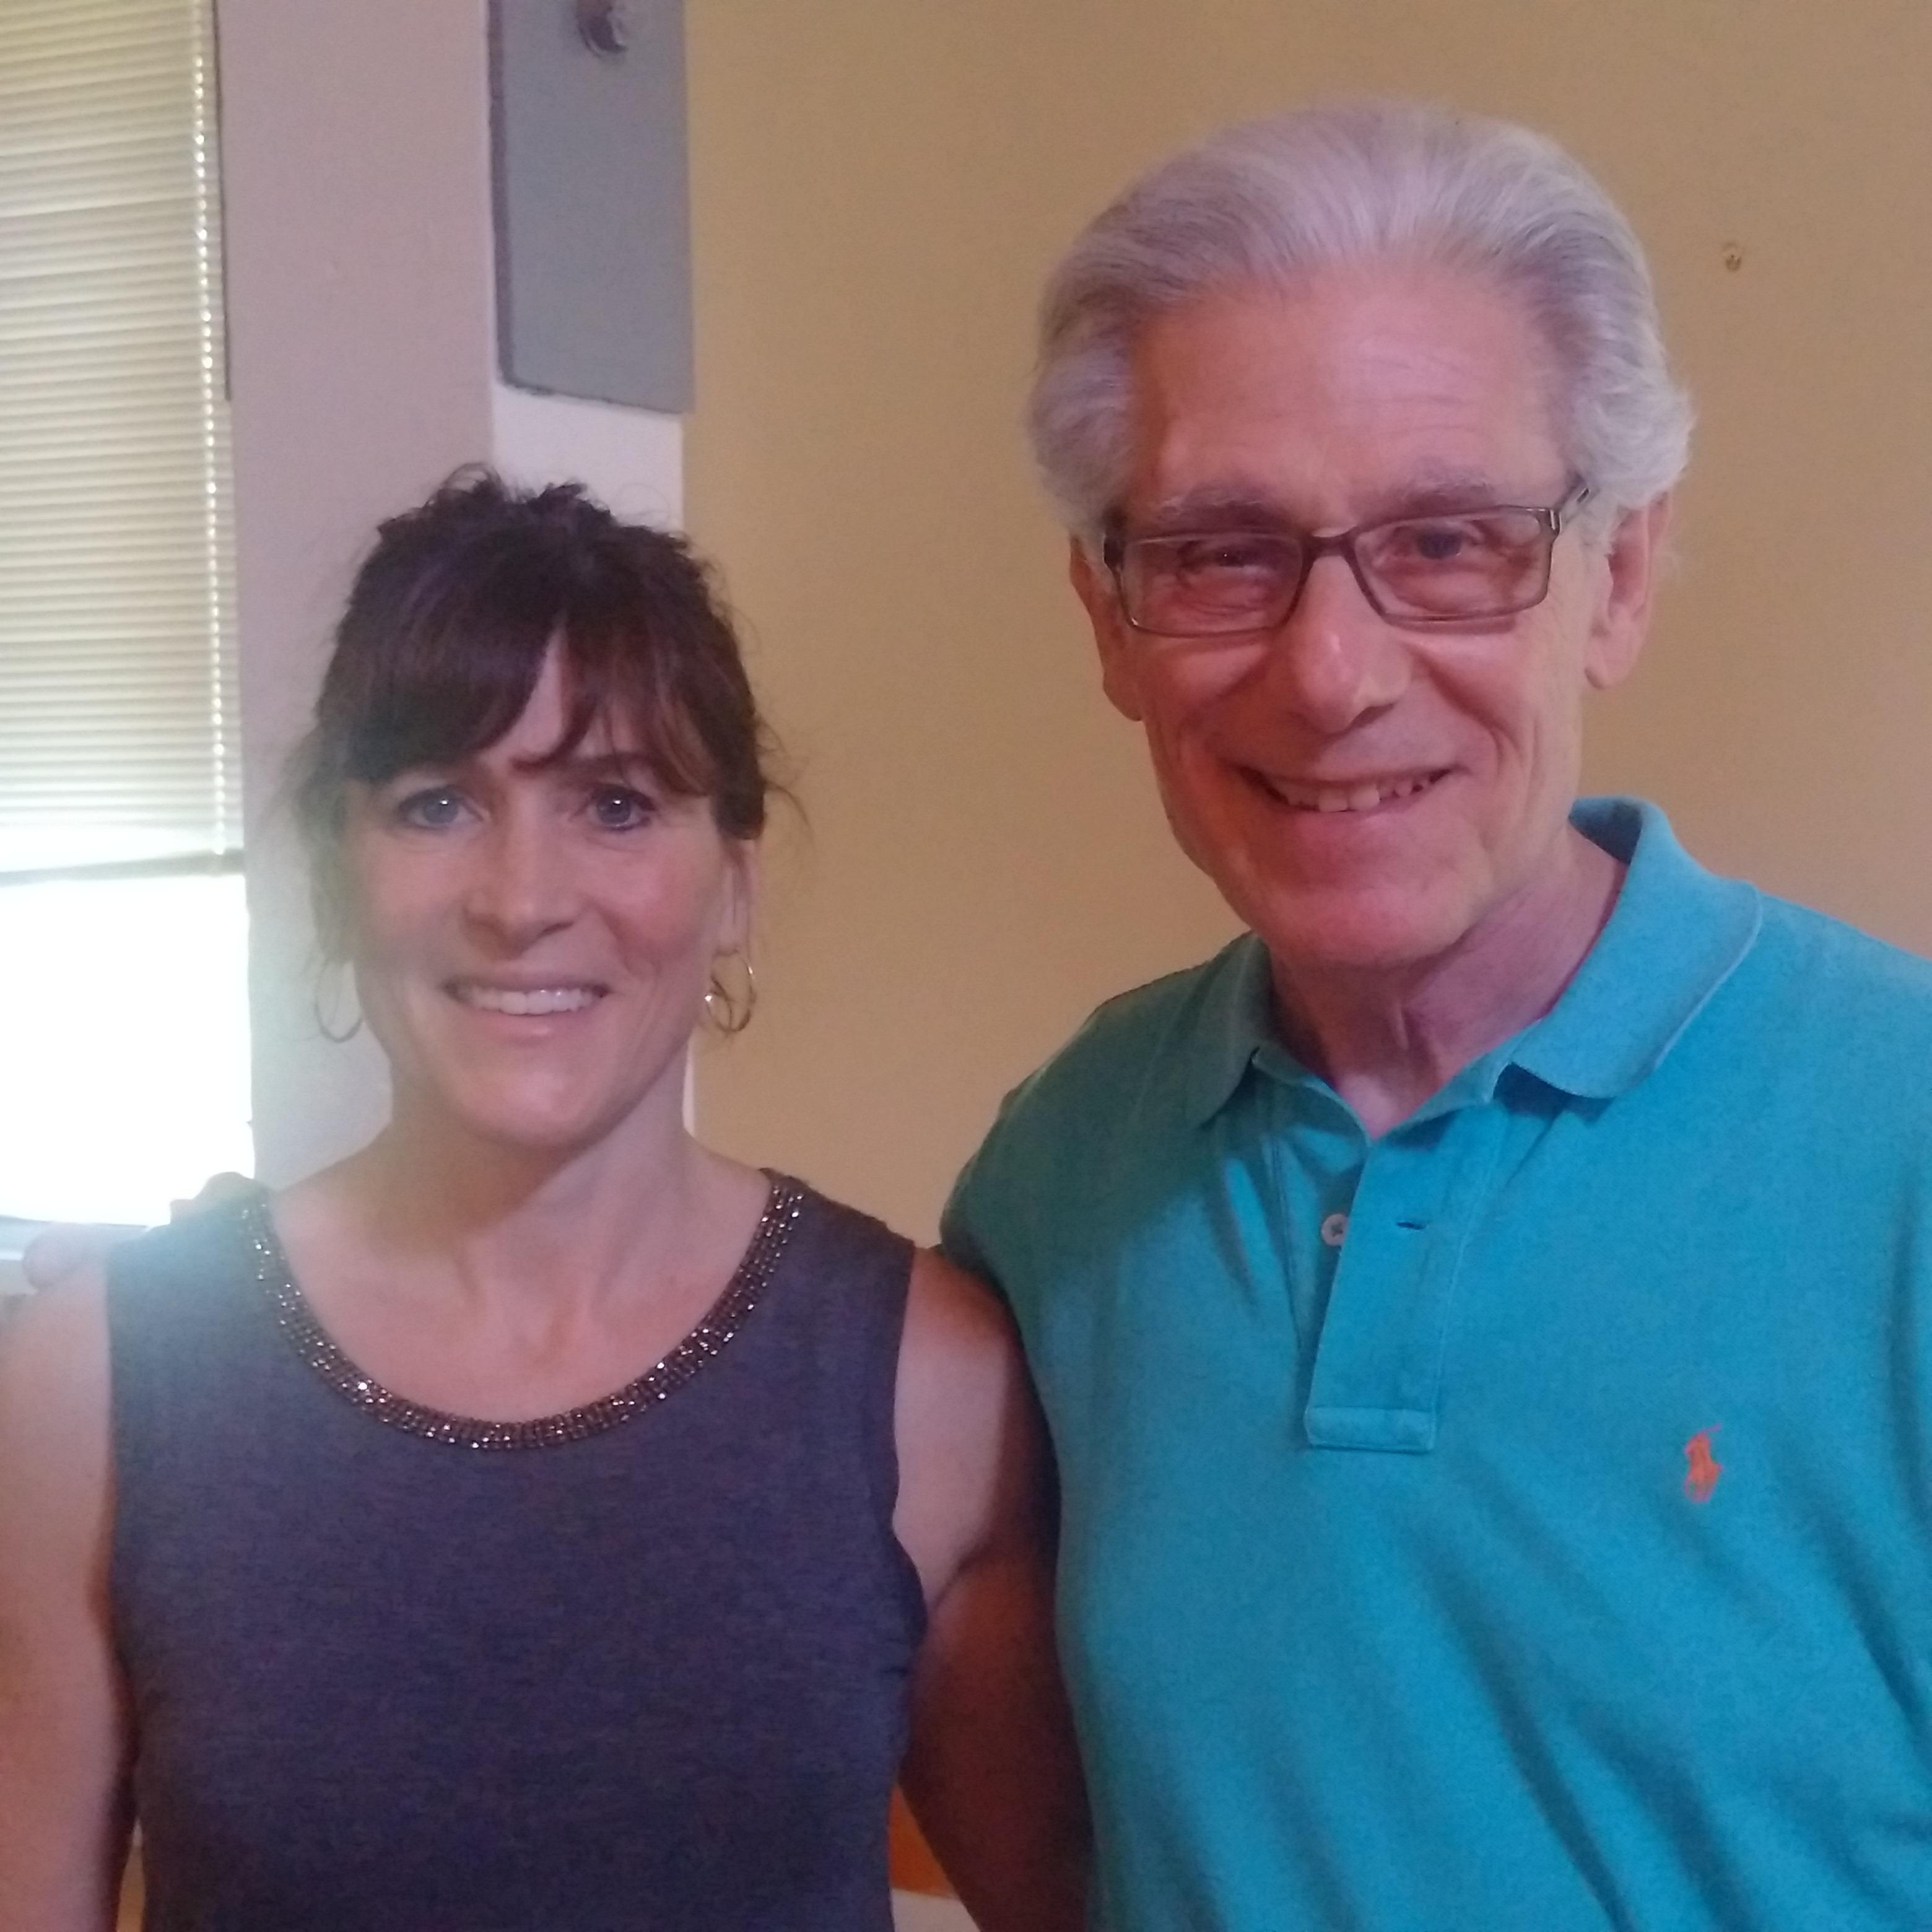 Past-Life Regression Therapy Workshop Recap